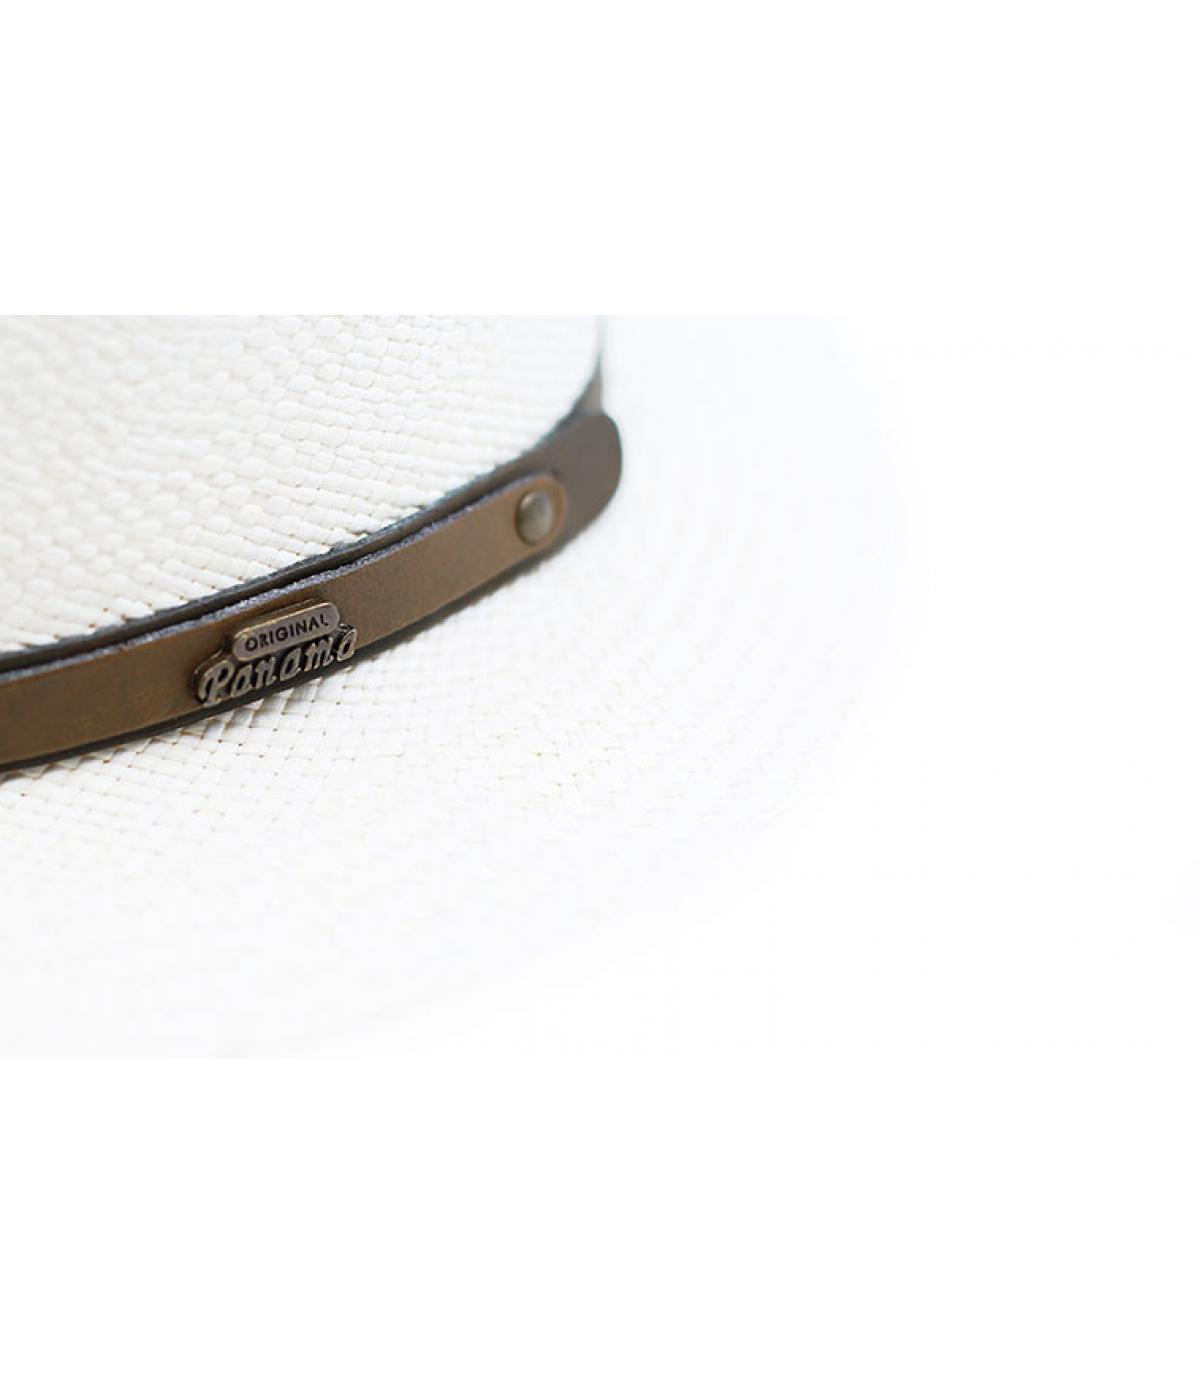 Details James Panama Brisas Superieur blanchi - afbeeling 3